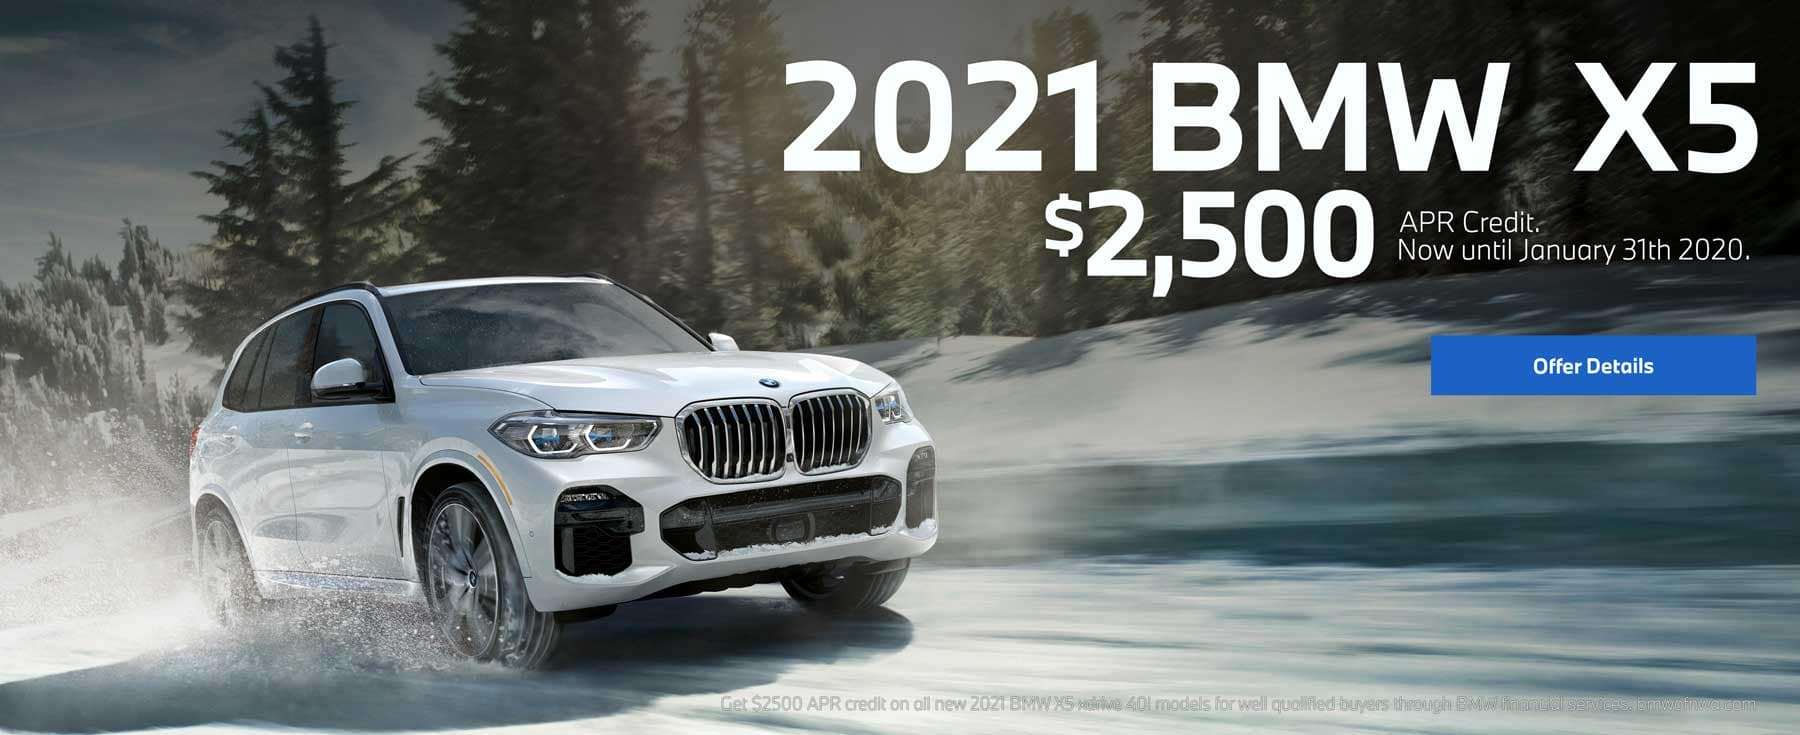 2021 bmw X5 $2500 apr cedit